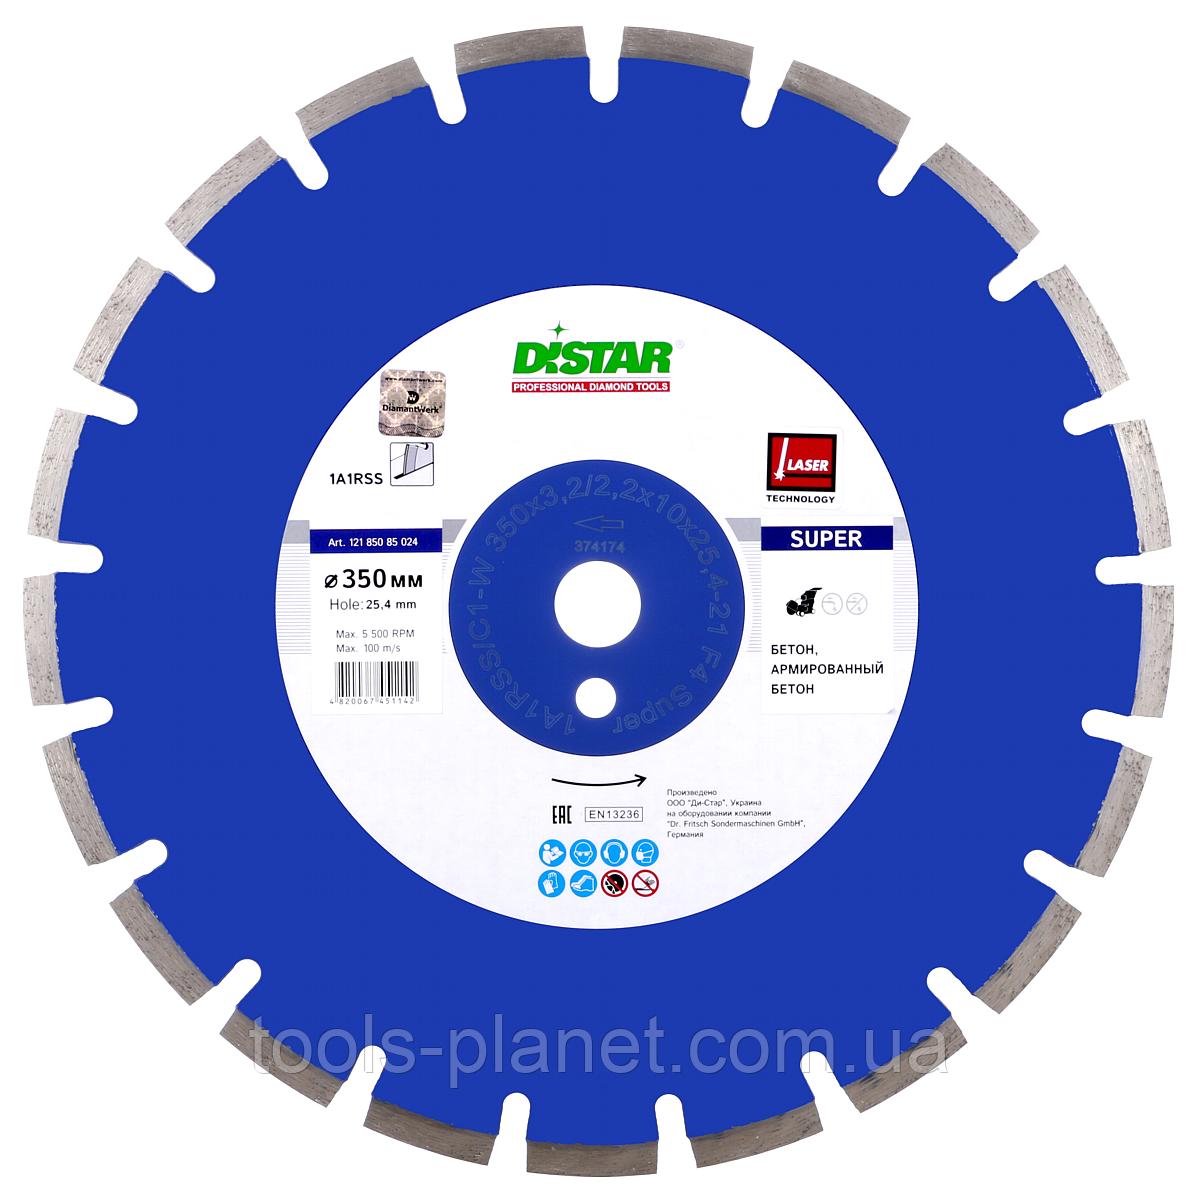 Алмазный диск Distar 1A1RSS/C1-W 450x3,8/2,8x10x25,4-26 F4 Super 7D (12185085028)